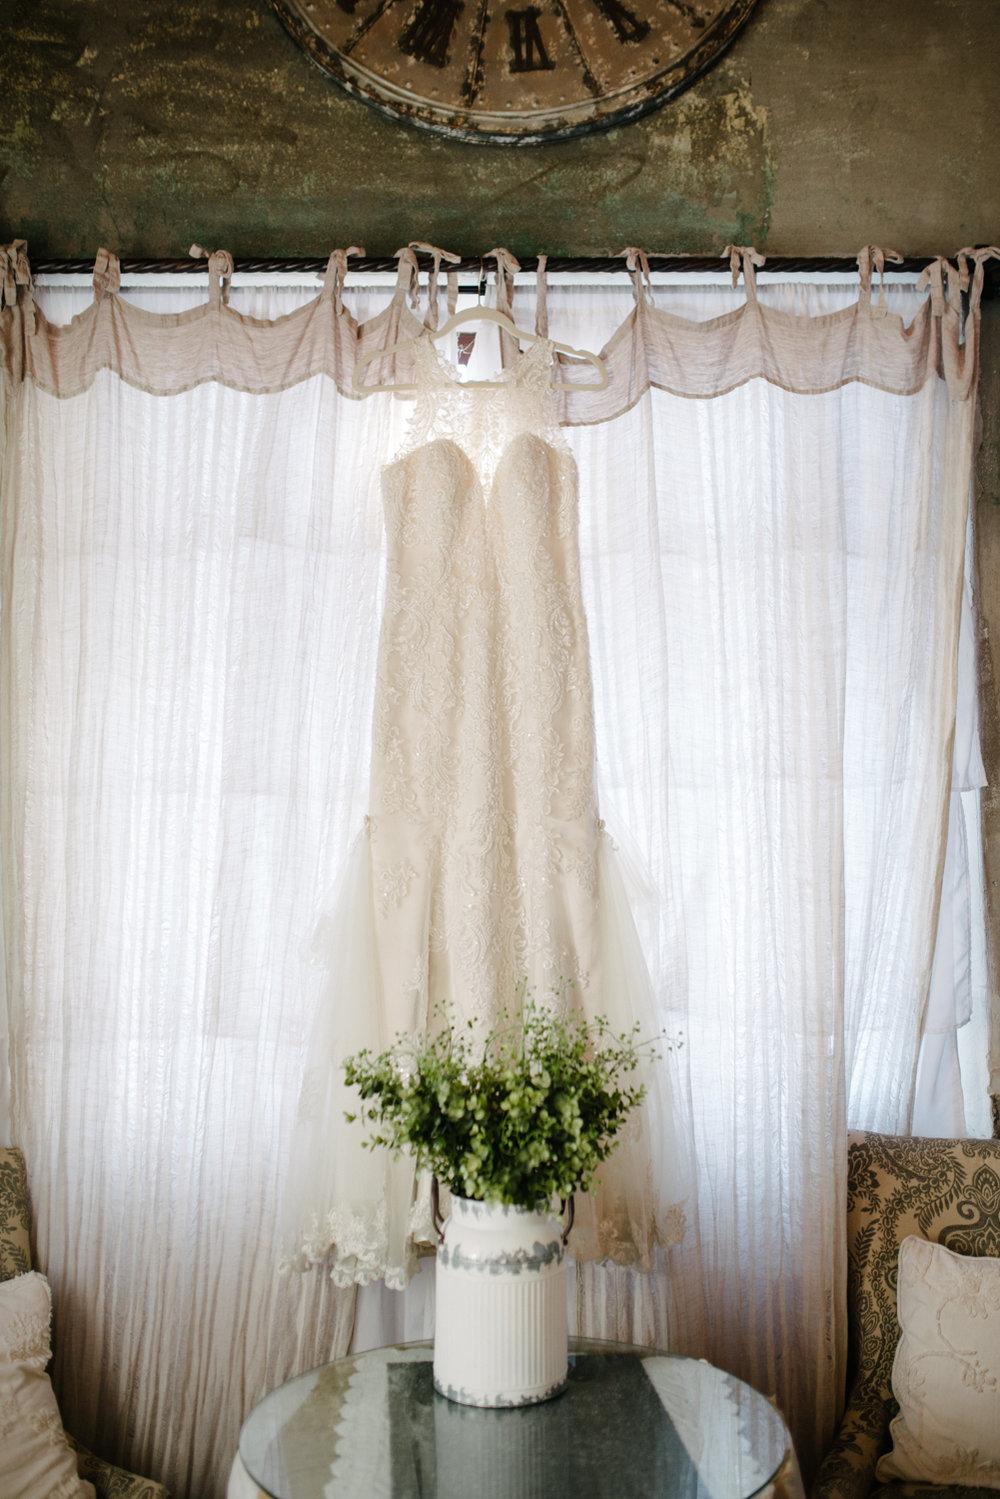 casperwedding-texasweddings-houstonweddings-oldedobbestation-montgomerytx-montgomeryweddings-bride-groom-bridalparty-weddingdress-17.jpg